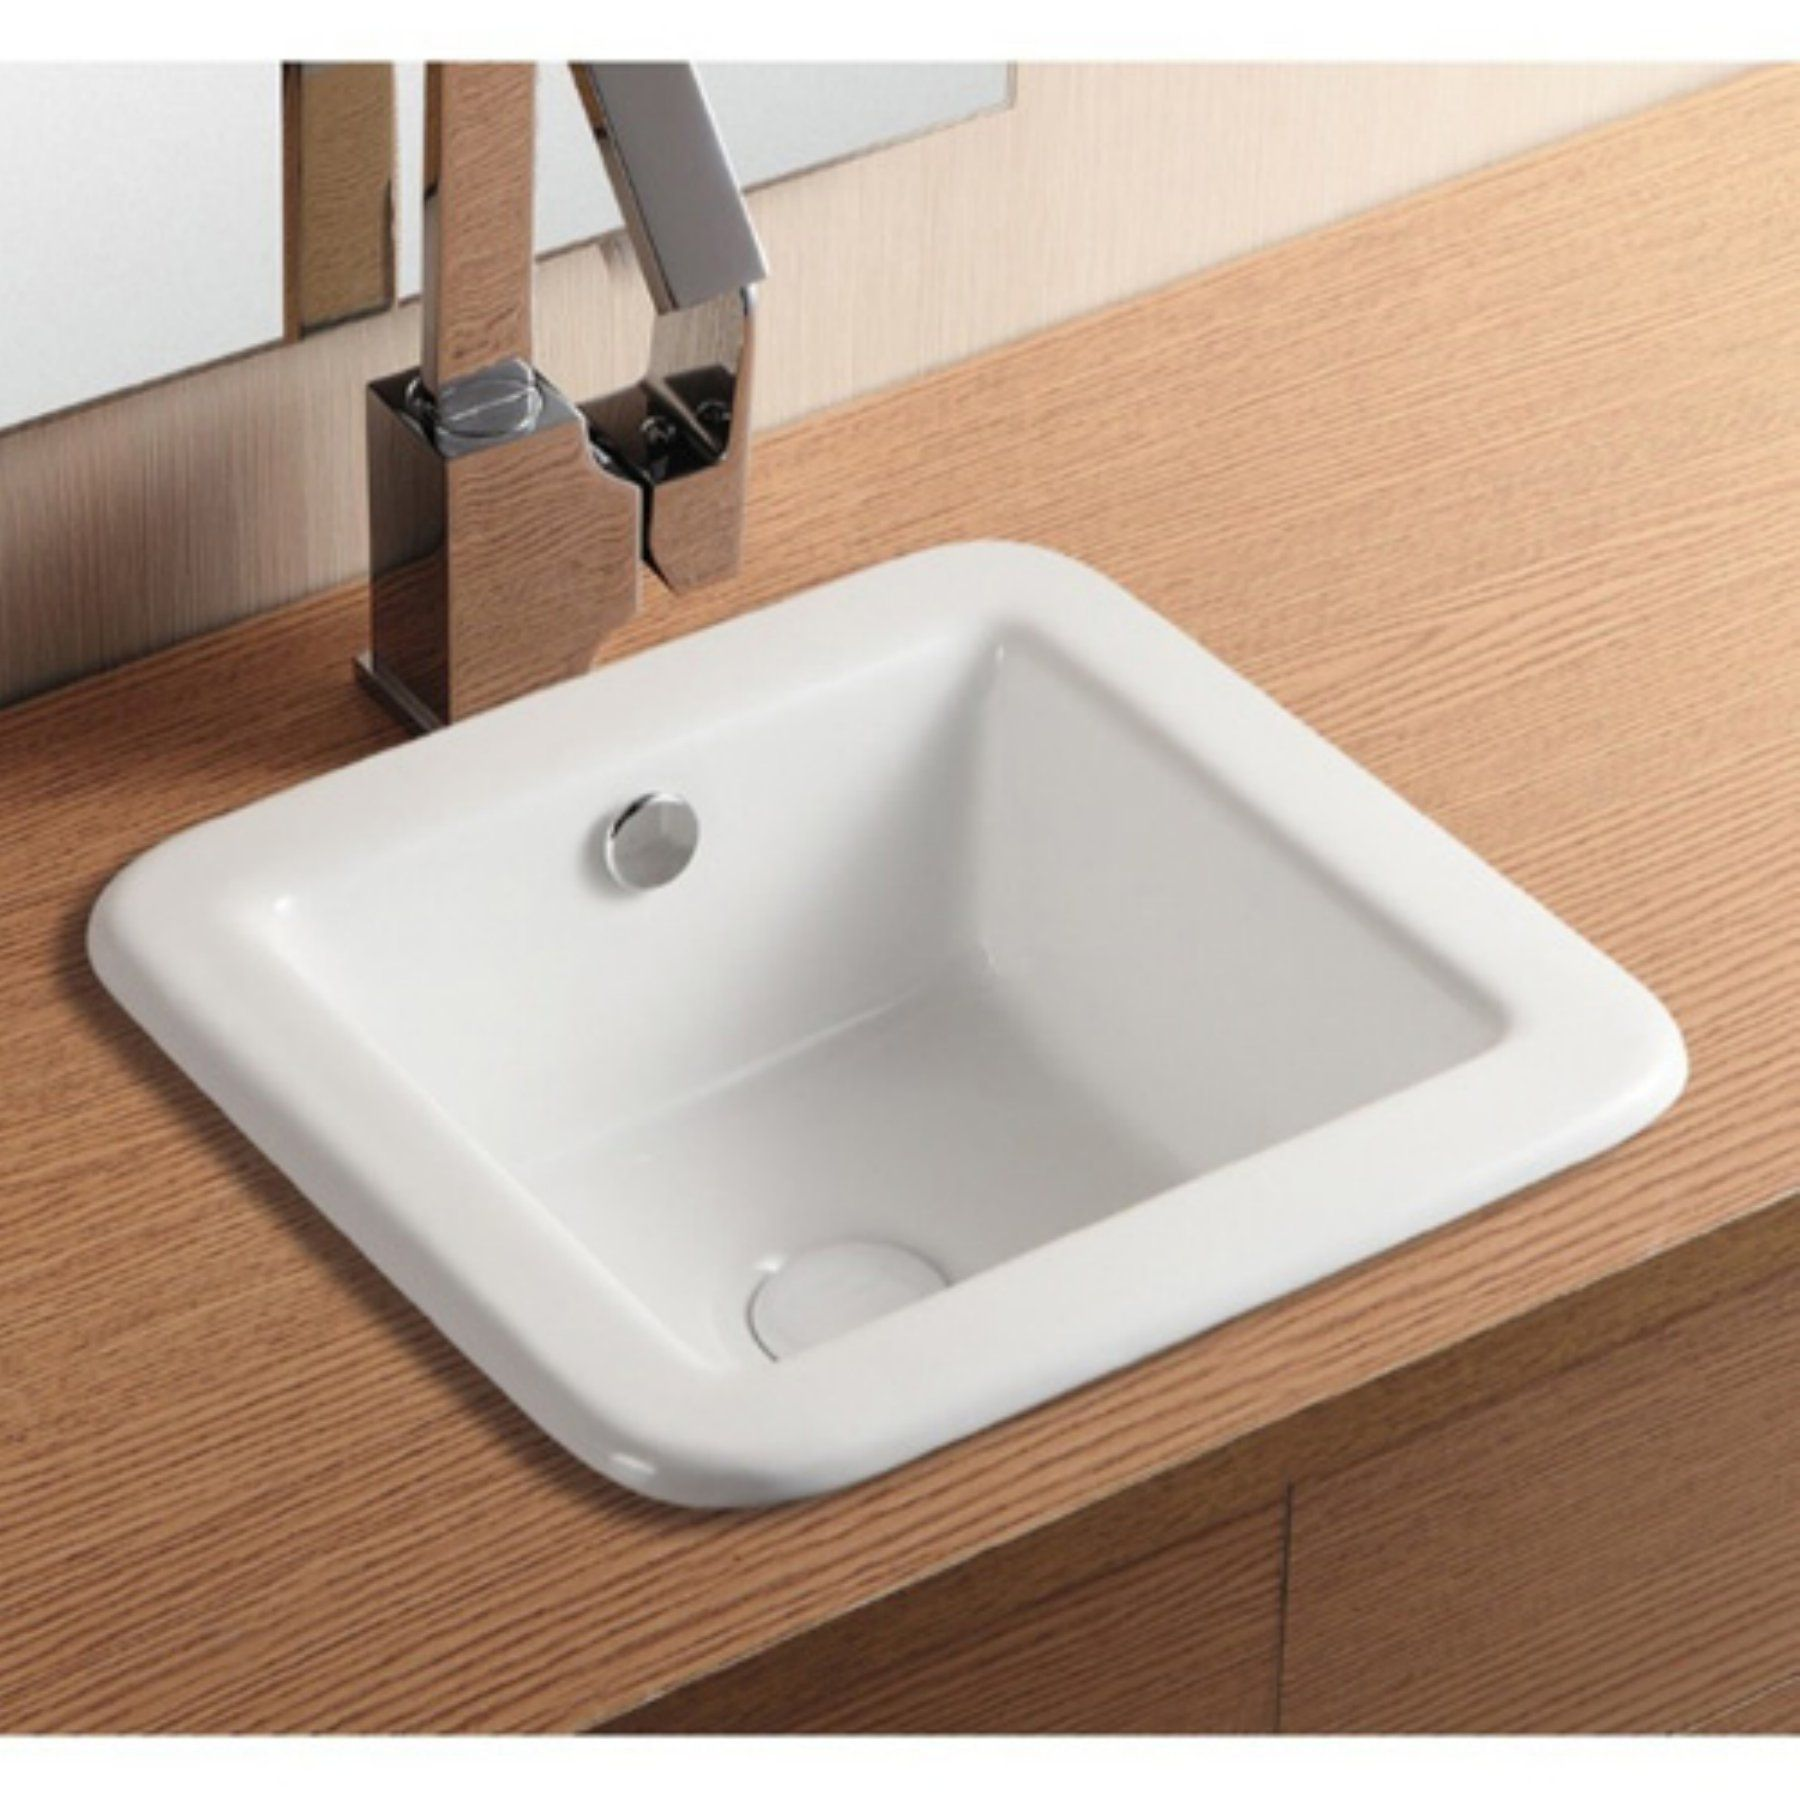 Caracalla by Nameeks CA4980 Bathroom Sink - White - CARACALLA CA4980-NO HOLE